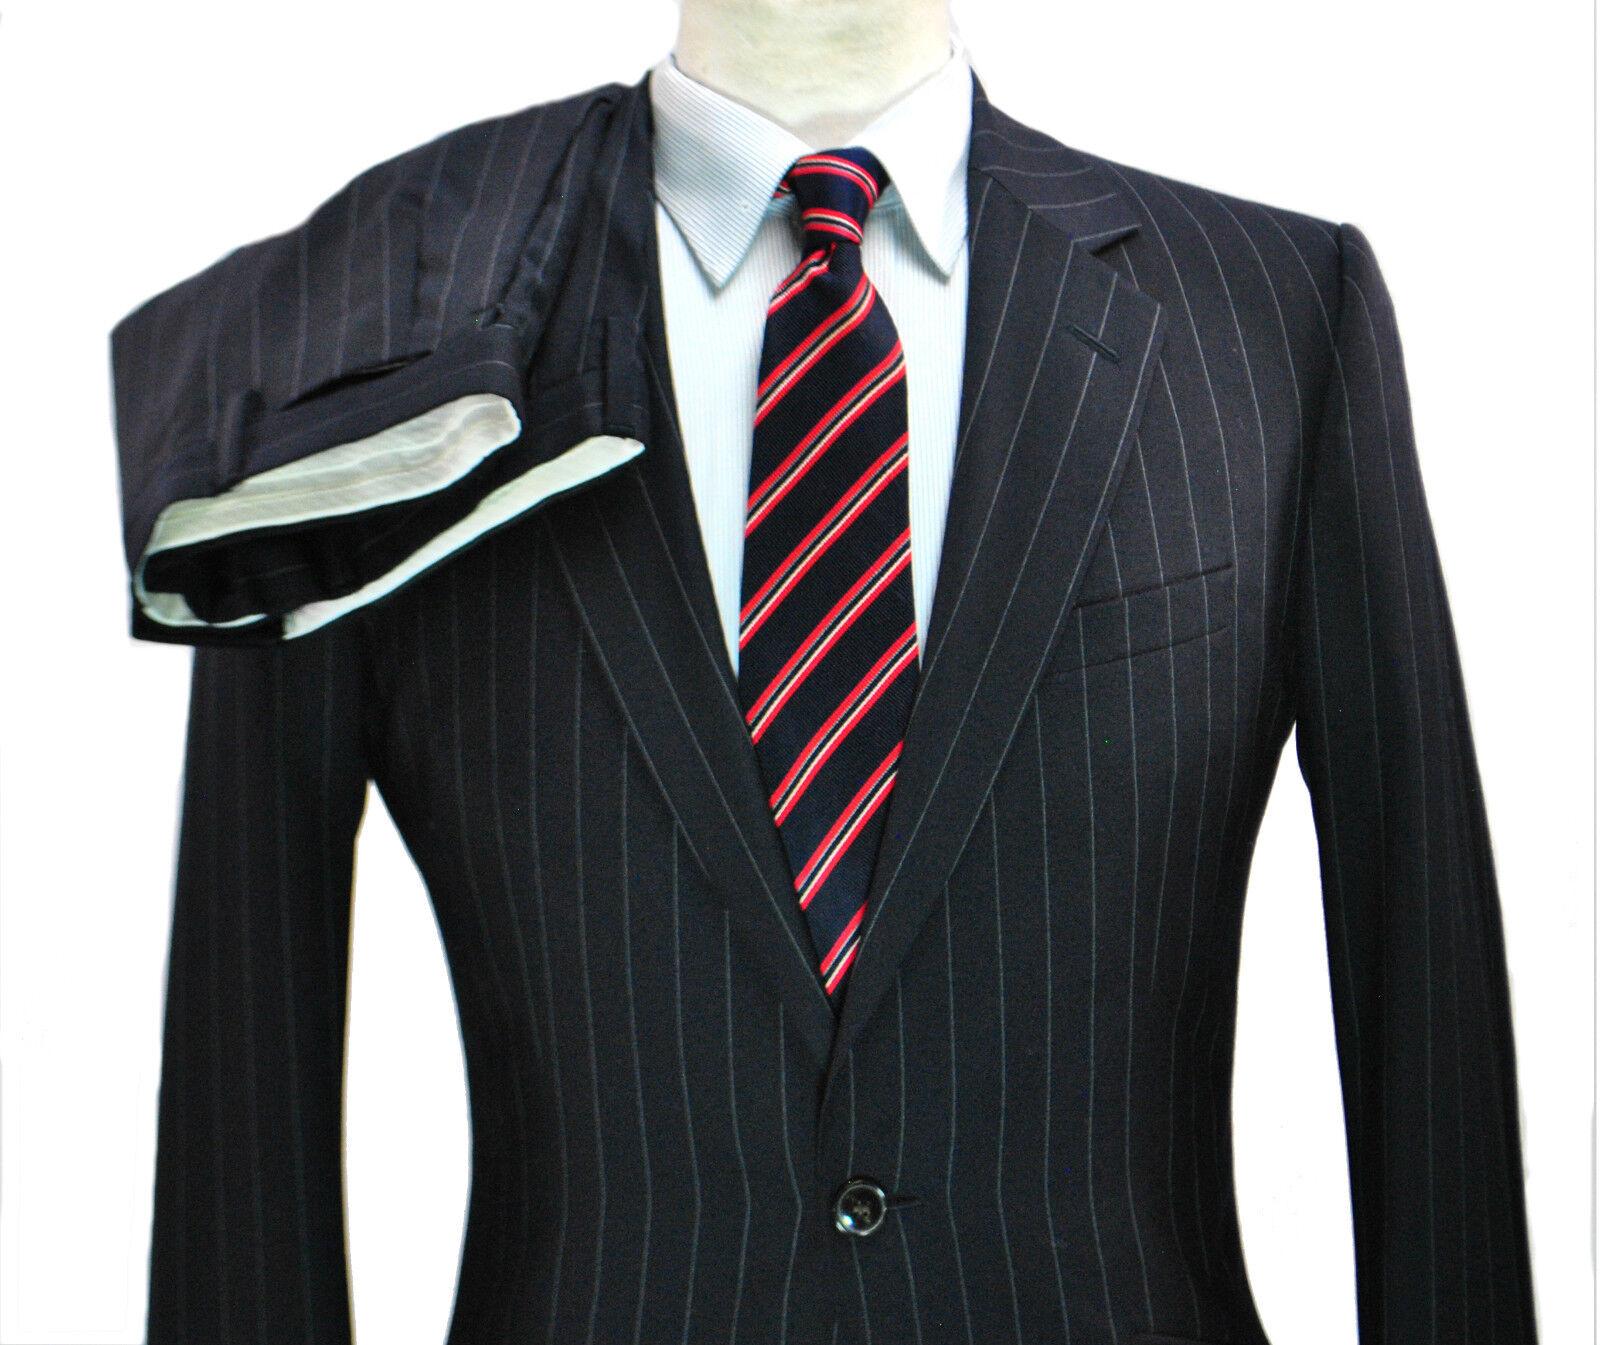 REISS Heston Navy Chalk Chalk Navy Stripe Suit Slim 36R 31x29 Small XS Worsted Wool blu ca9ed8